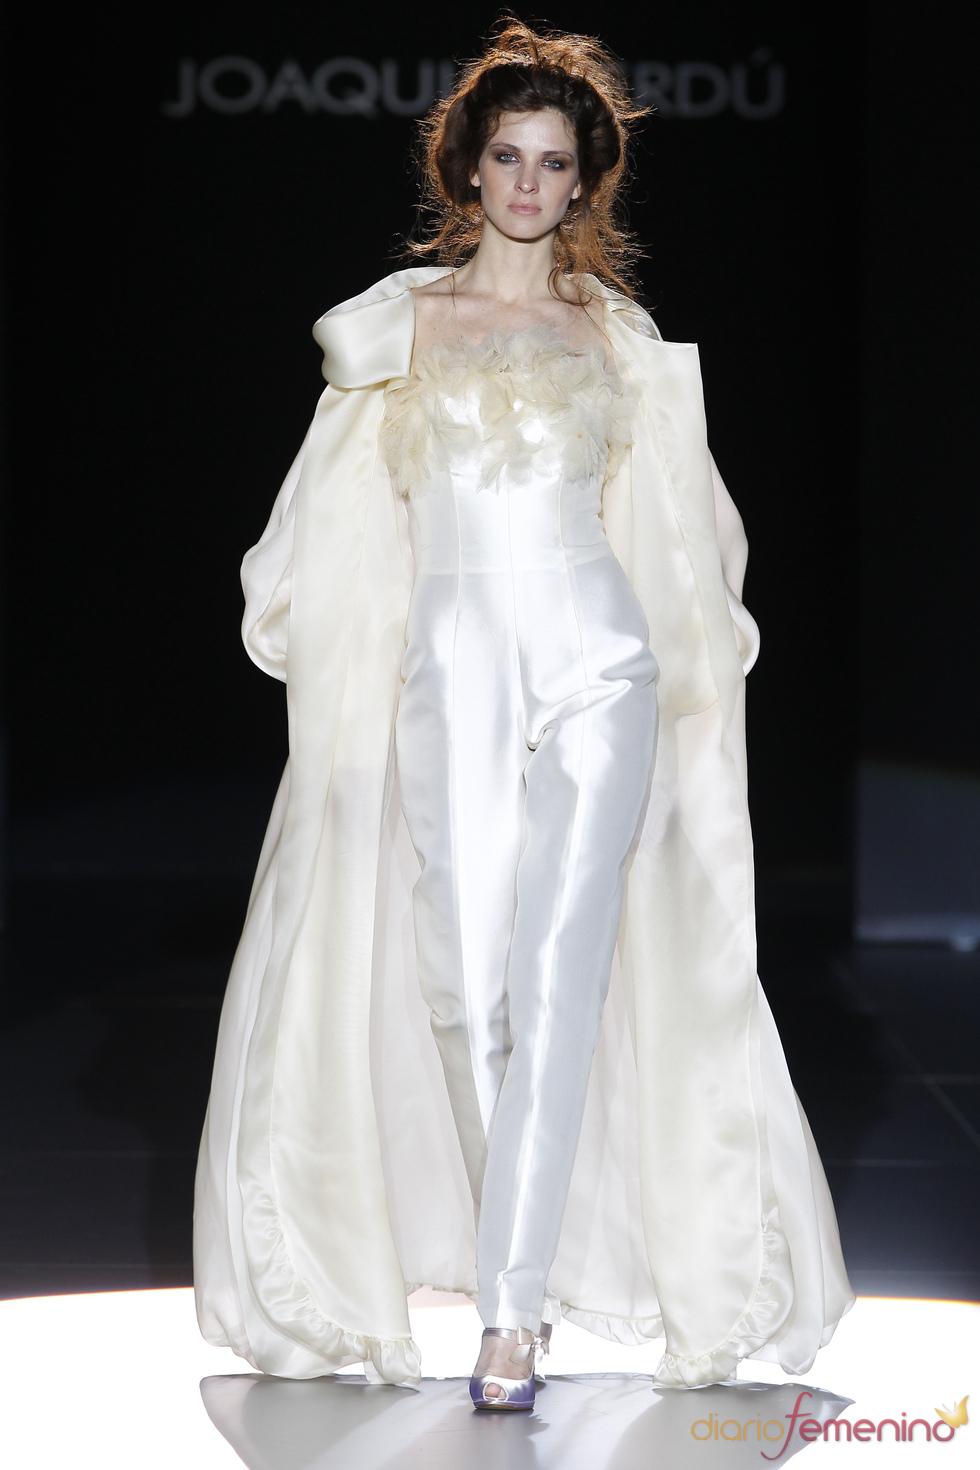 Joaquim Verdú viste a la novia con pantalón